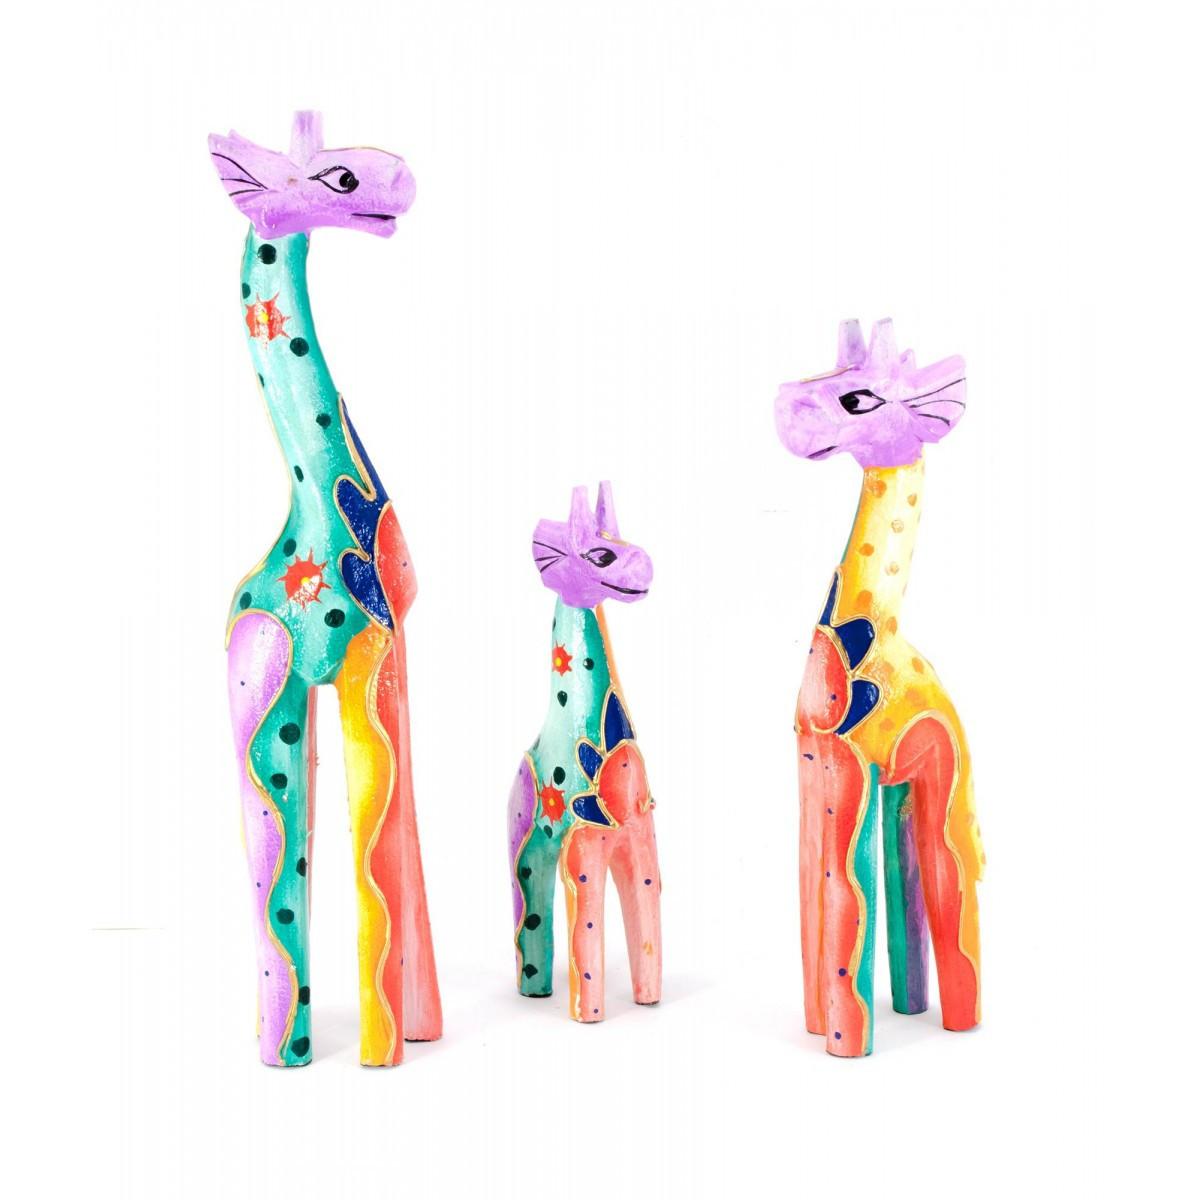 Жирафы 3 шт деревянные 25х5,5х3 см 19,5х5х3 см 15х4х3 см 29851